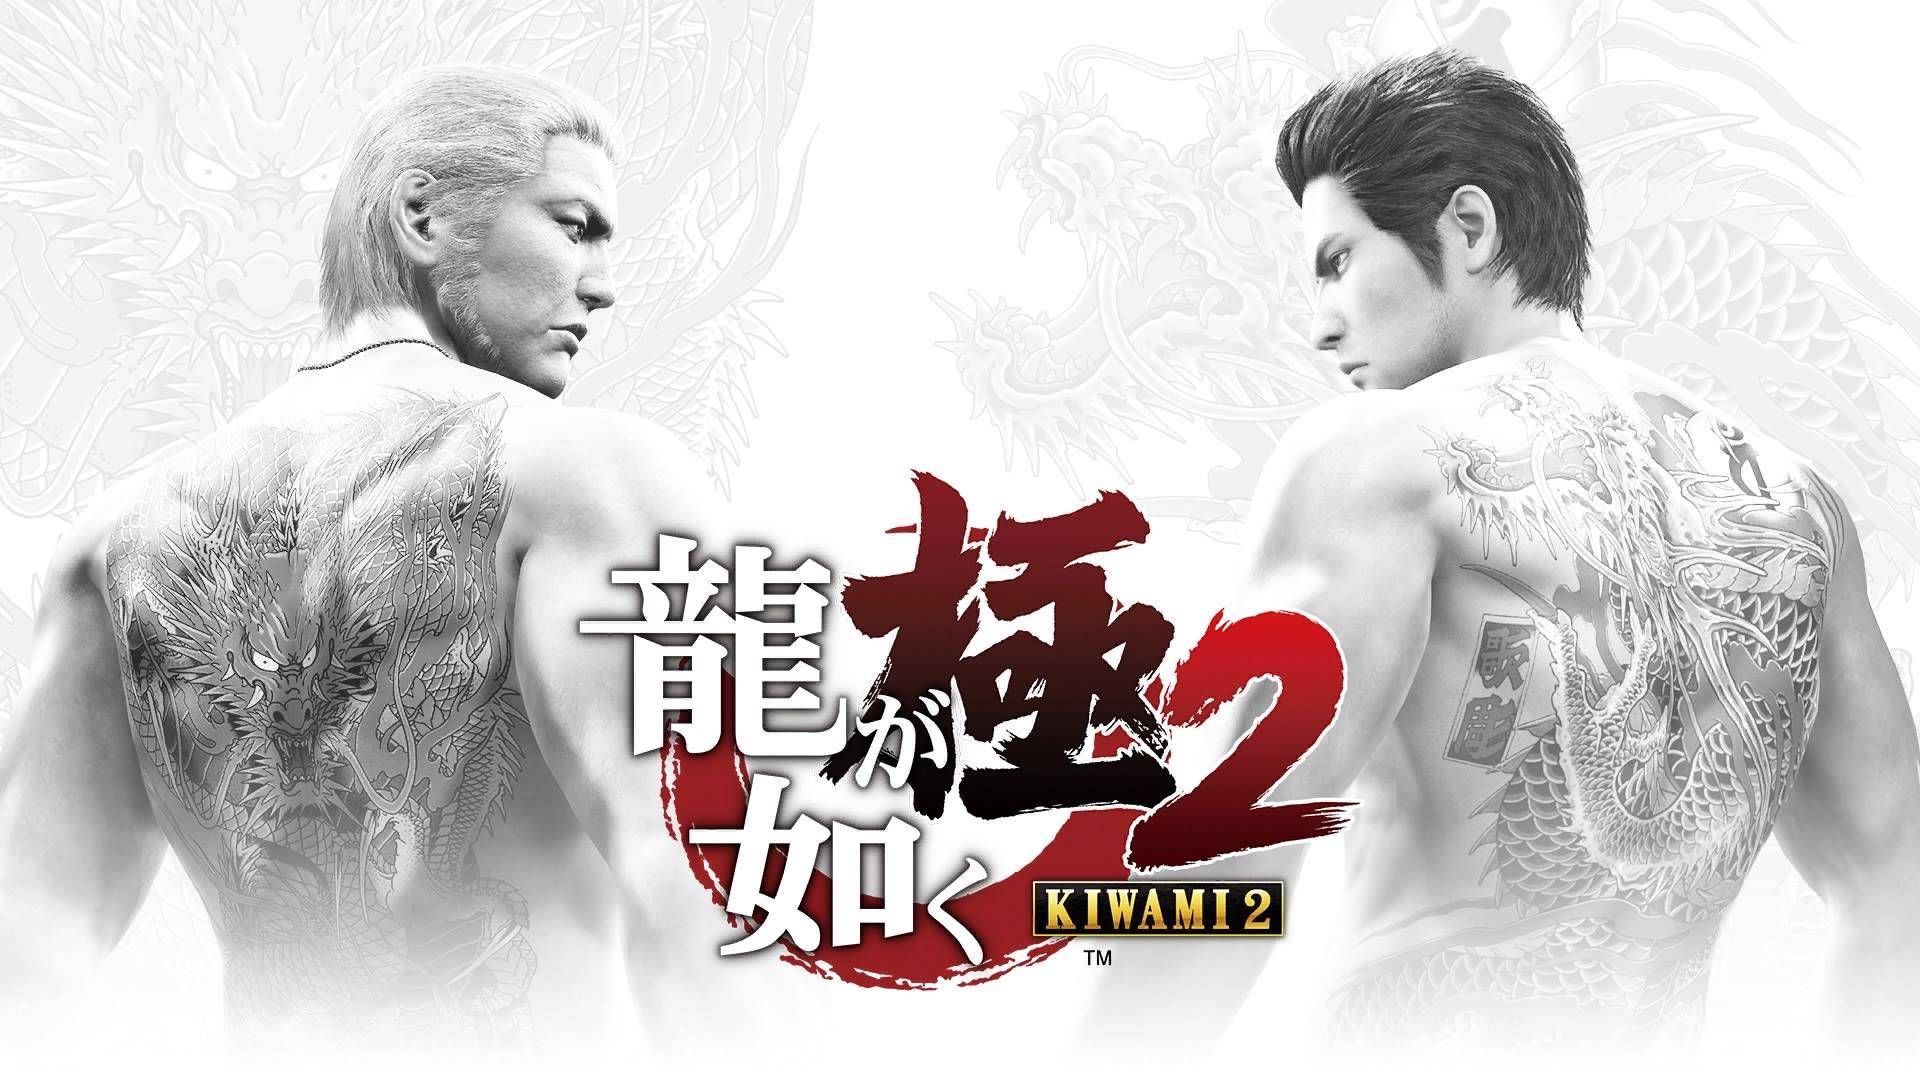 1920x1080 Yakuza Kiwami 2 Two Dragons Need Trendy Iphone7 Iphone7plus Case Check Out Https Ift Tt 2itgto5 Retro Video Games Kiryu Latest Games